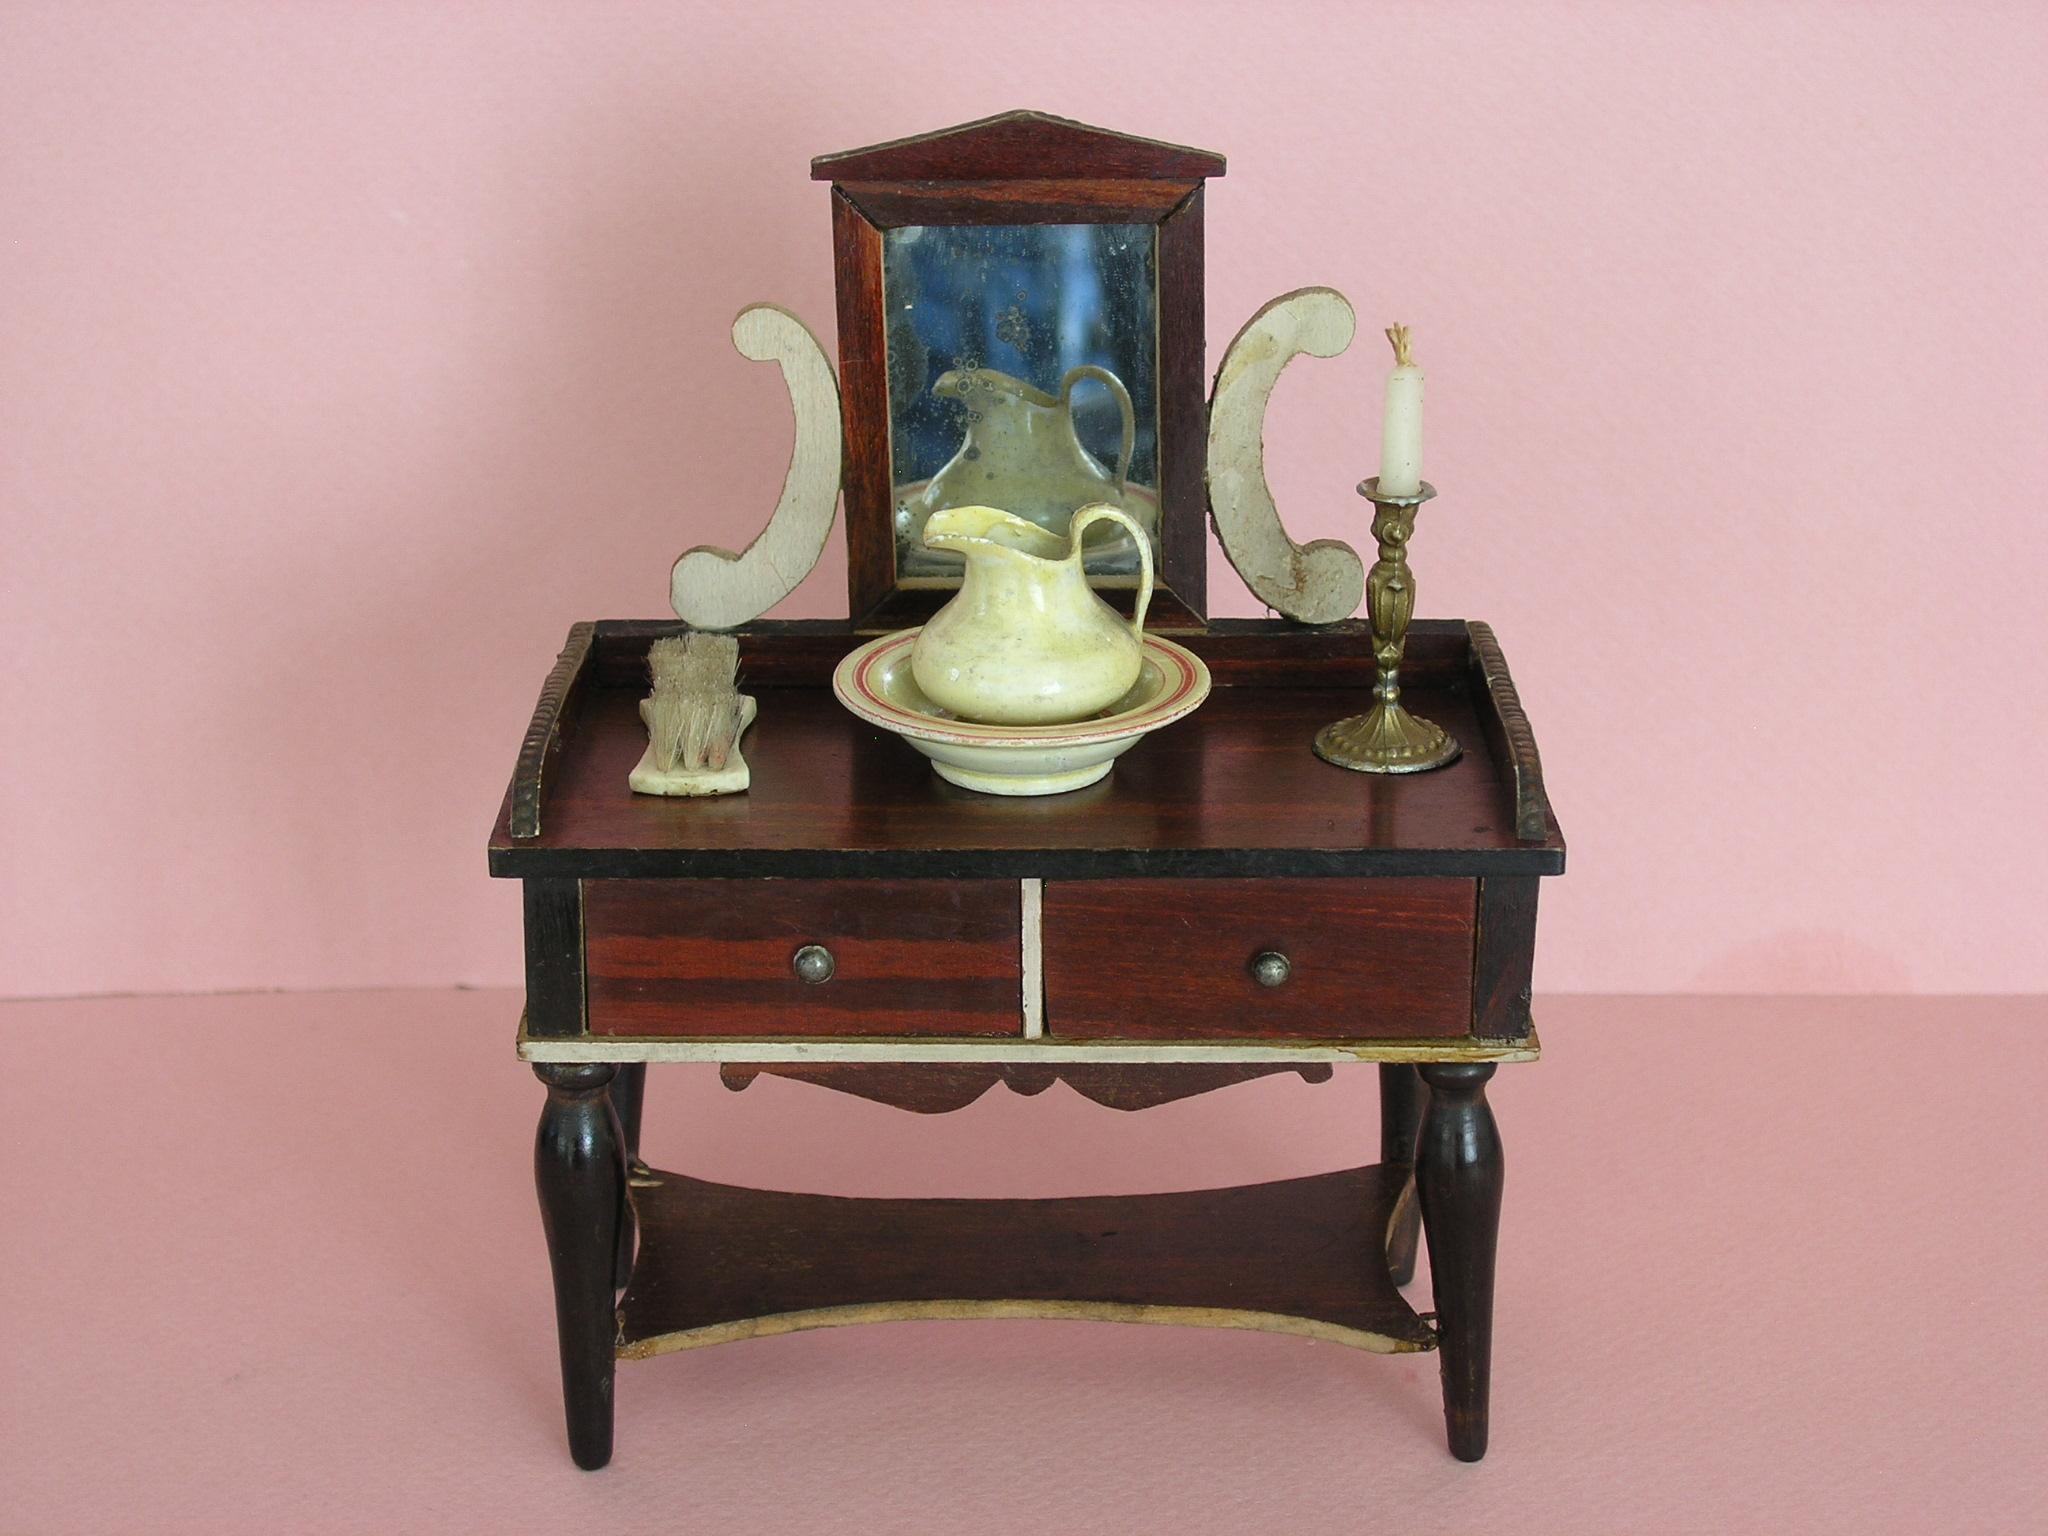 Early biedermeier dressing table made by kestner ca 1850 for Made dressing table